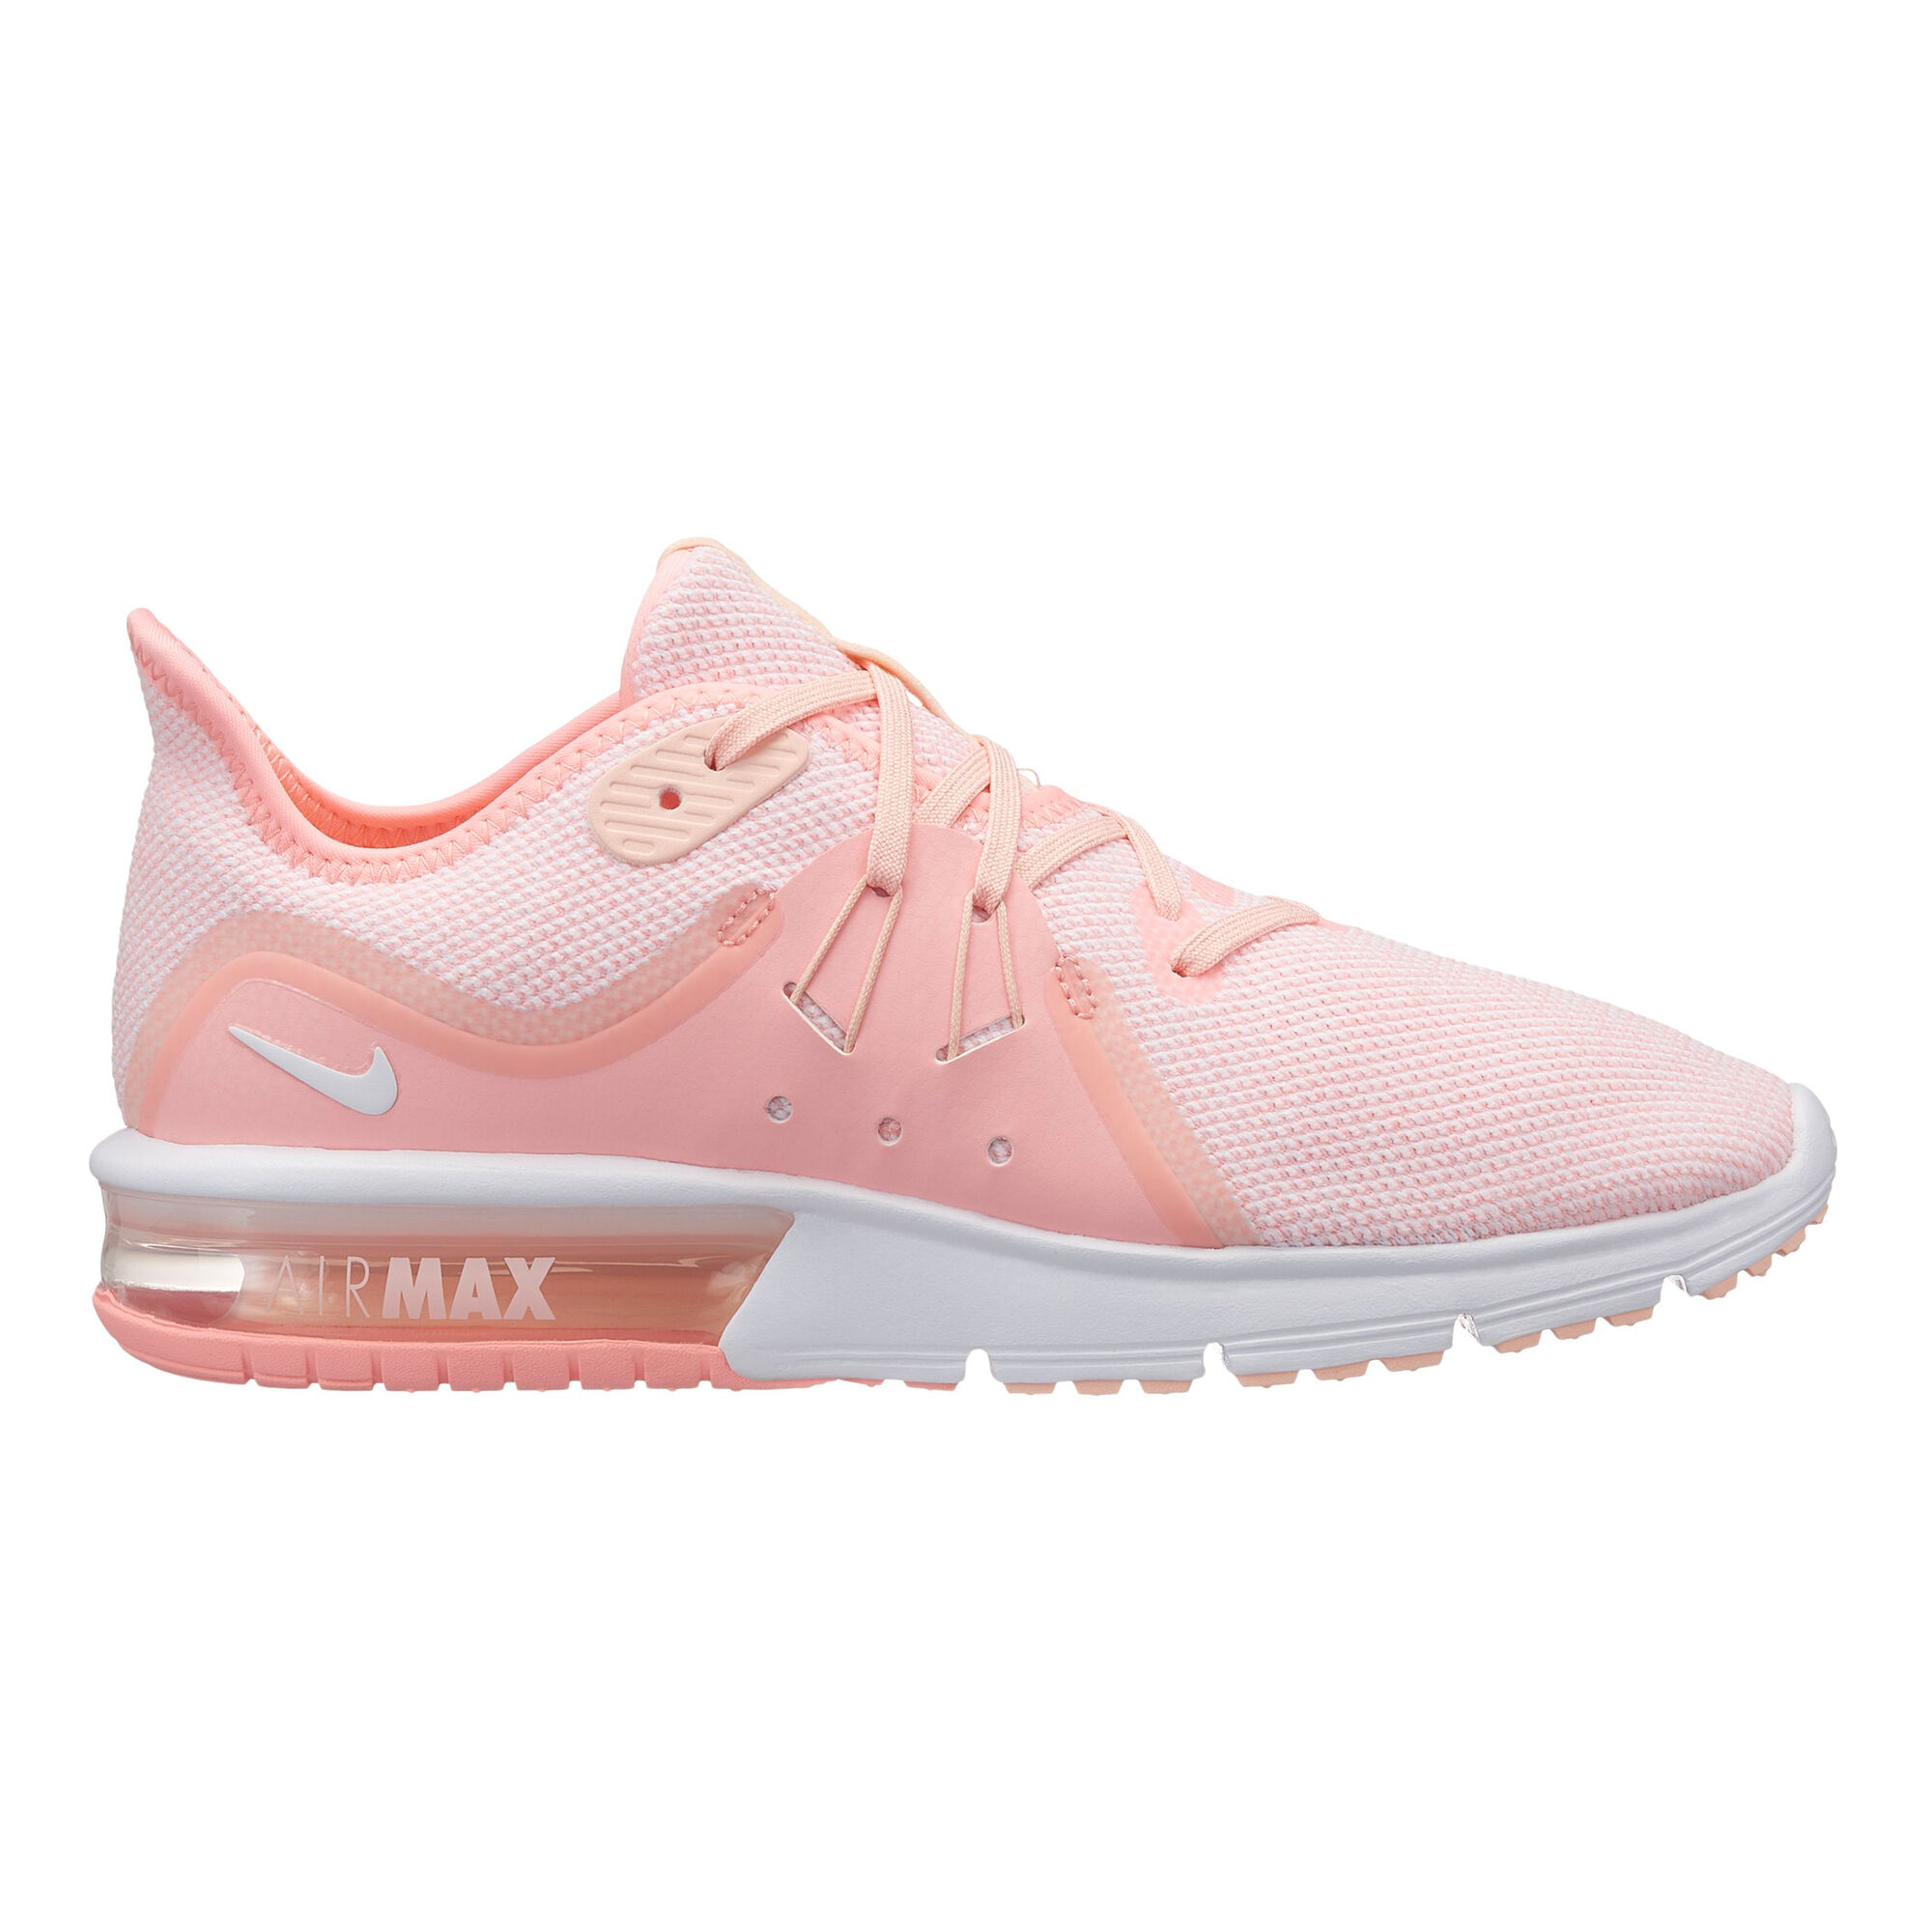 7301faf3b7b buy Nike Air Max Sequent 3 Neutral Running Shoe Women - Pink ...